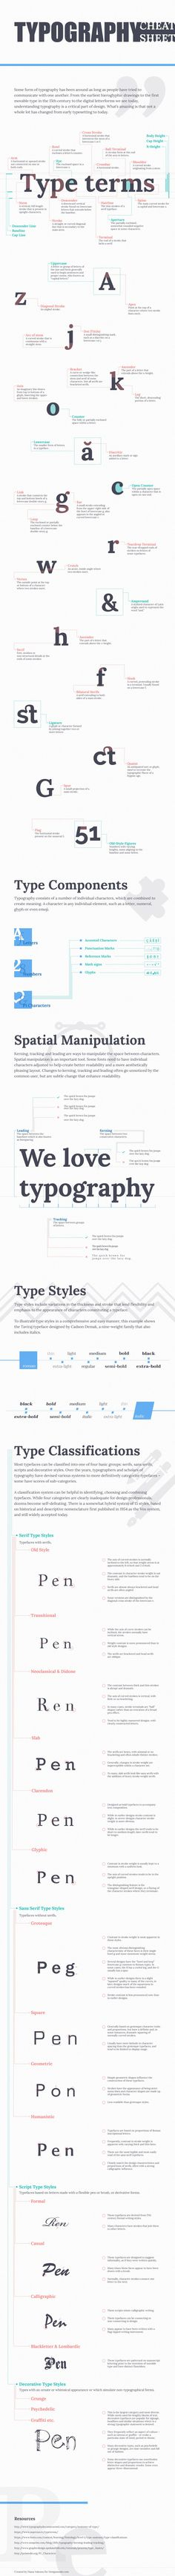 Typography Cheat Sheet [Infographic] - http://designmodo.com/typography-cheat-sheet/